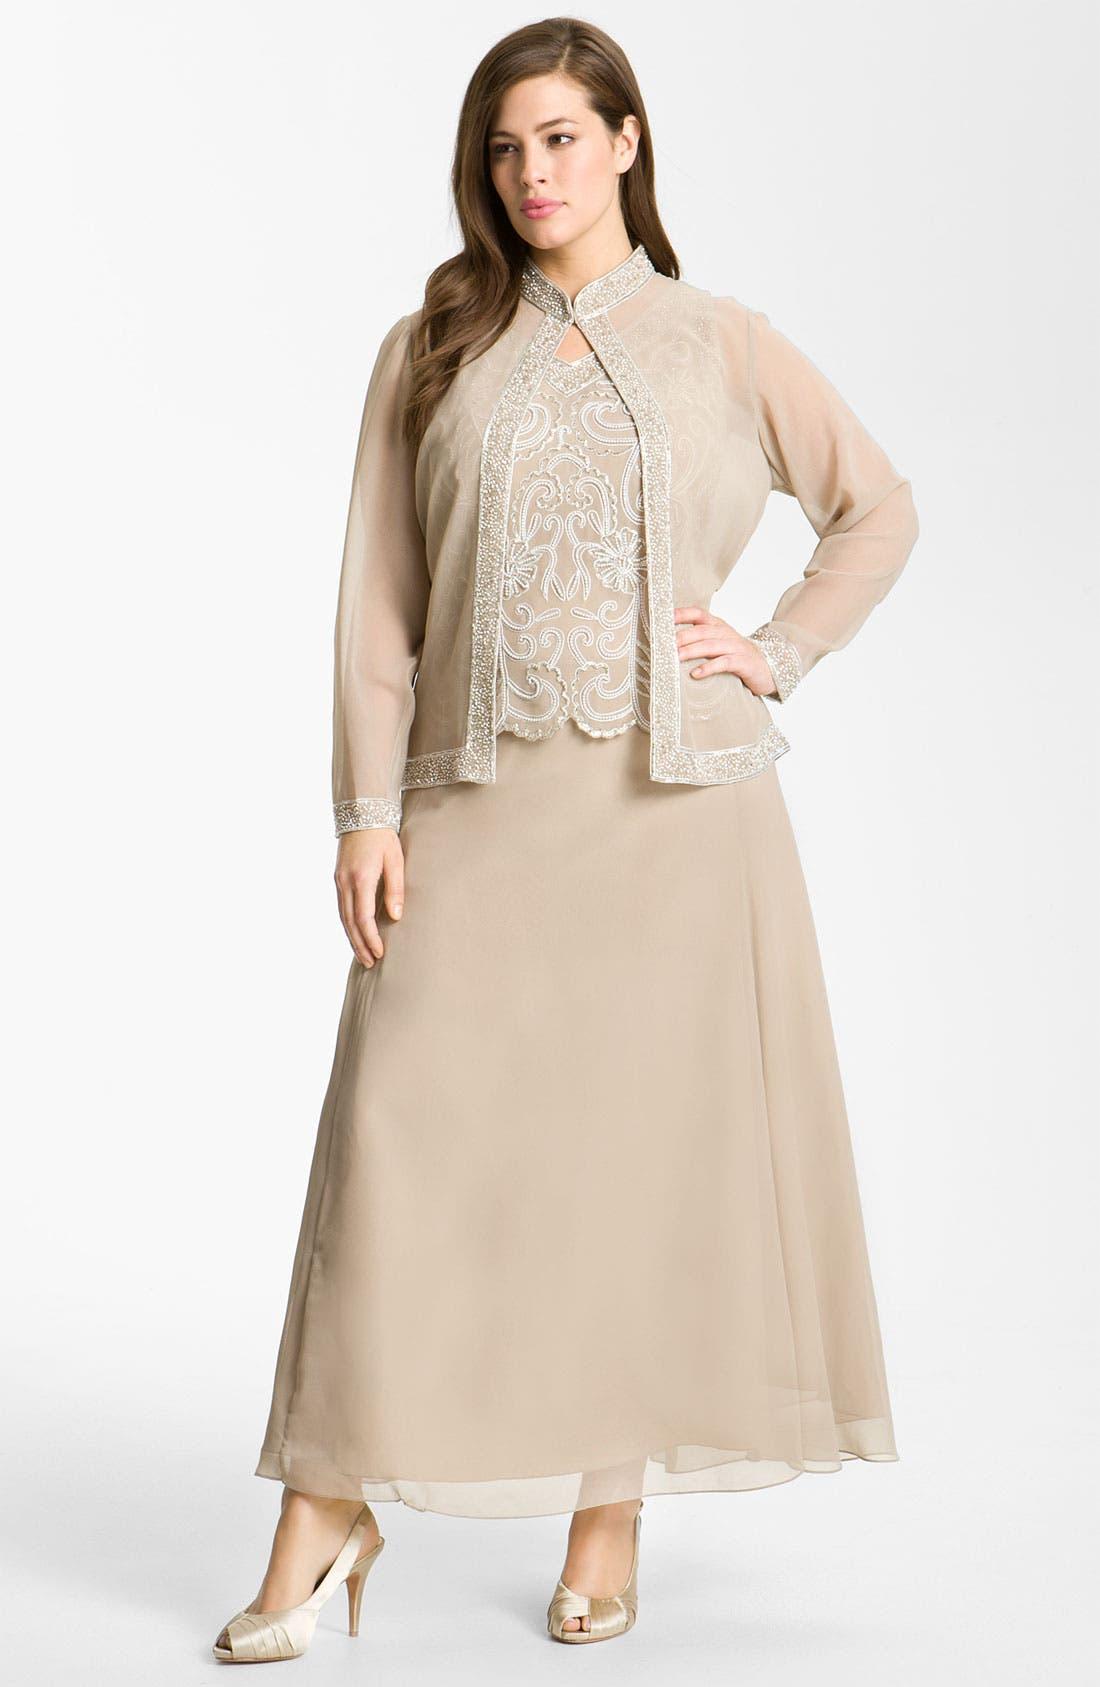 Main Image - J Kara Sheer Beaded Chiffon Gown & Jacket (Plus)